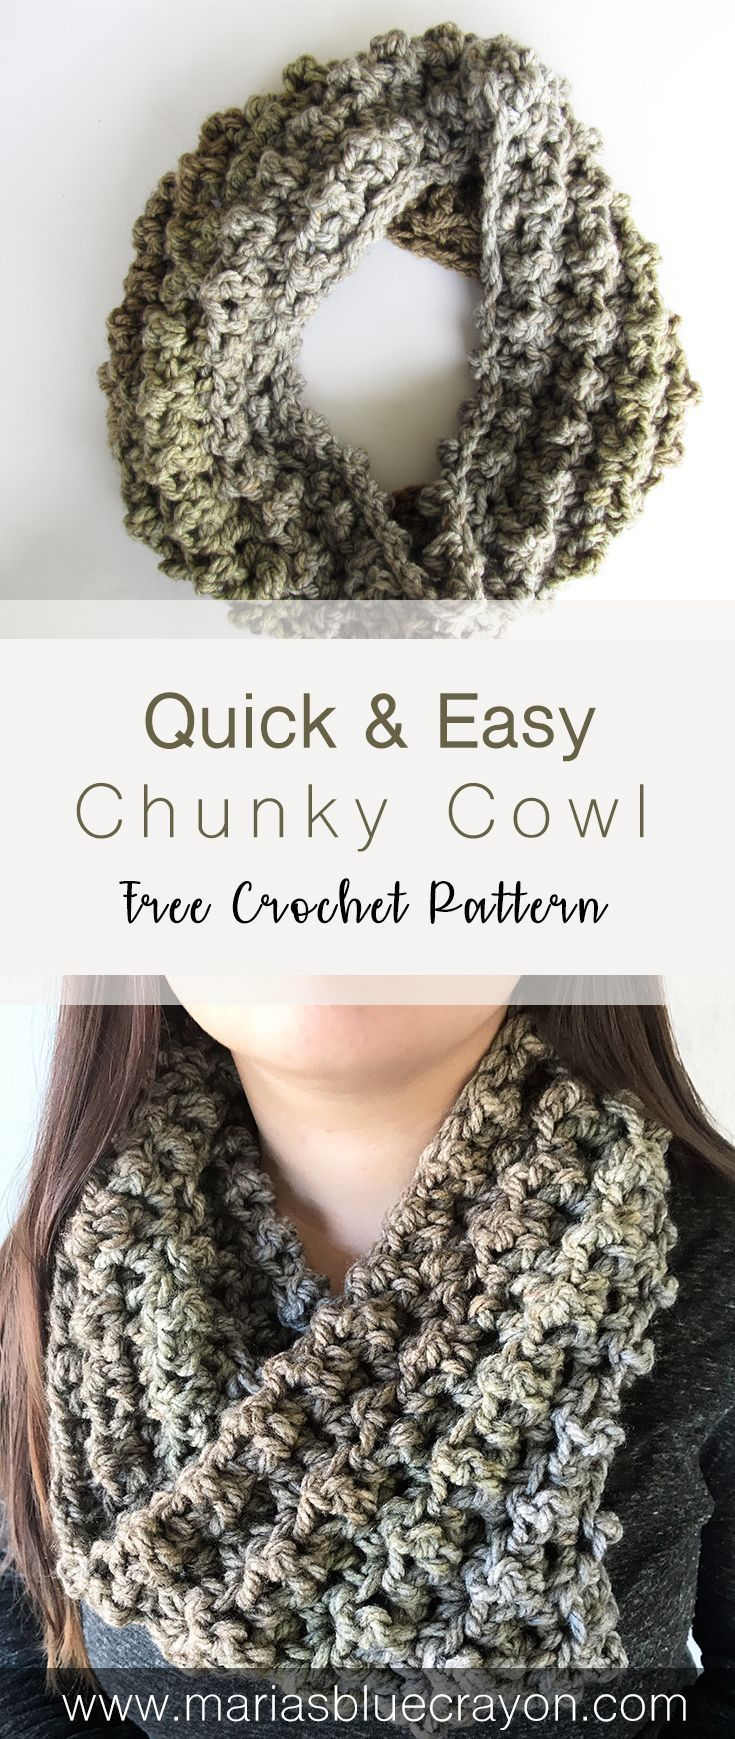 Easy & Quick Crochet Chunky Cowl | Free Crochet Pattern | Beginner Crochet Pattern | Last Minute Crochet Gift | Maria's Blue Crayon